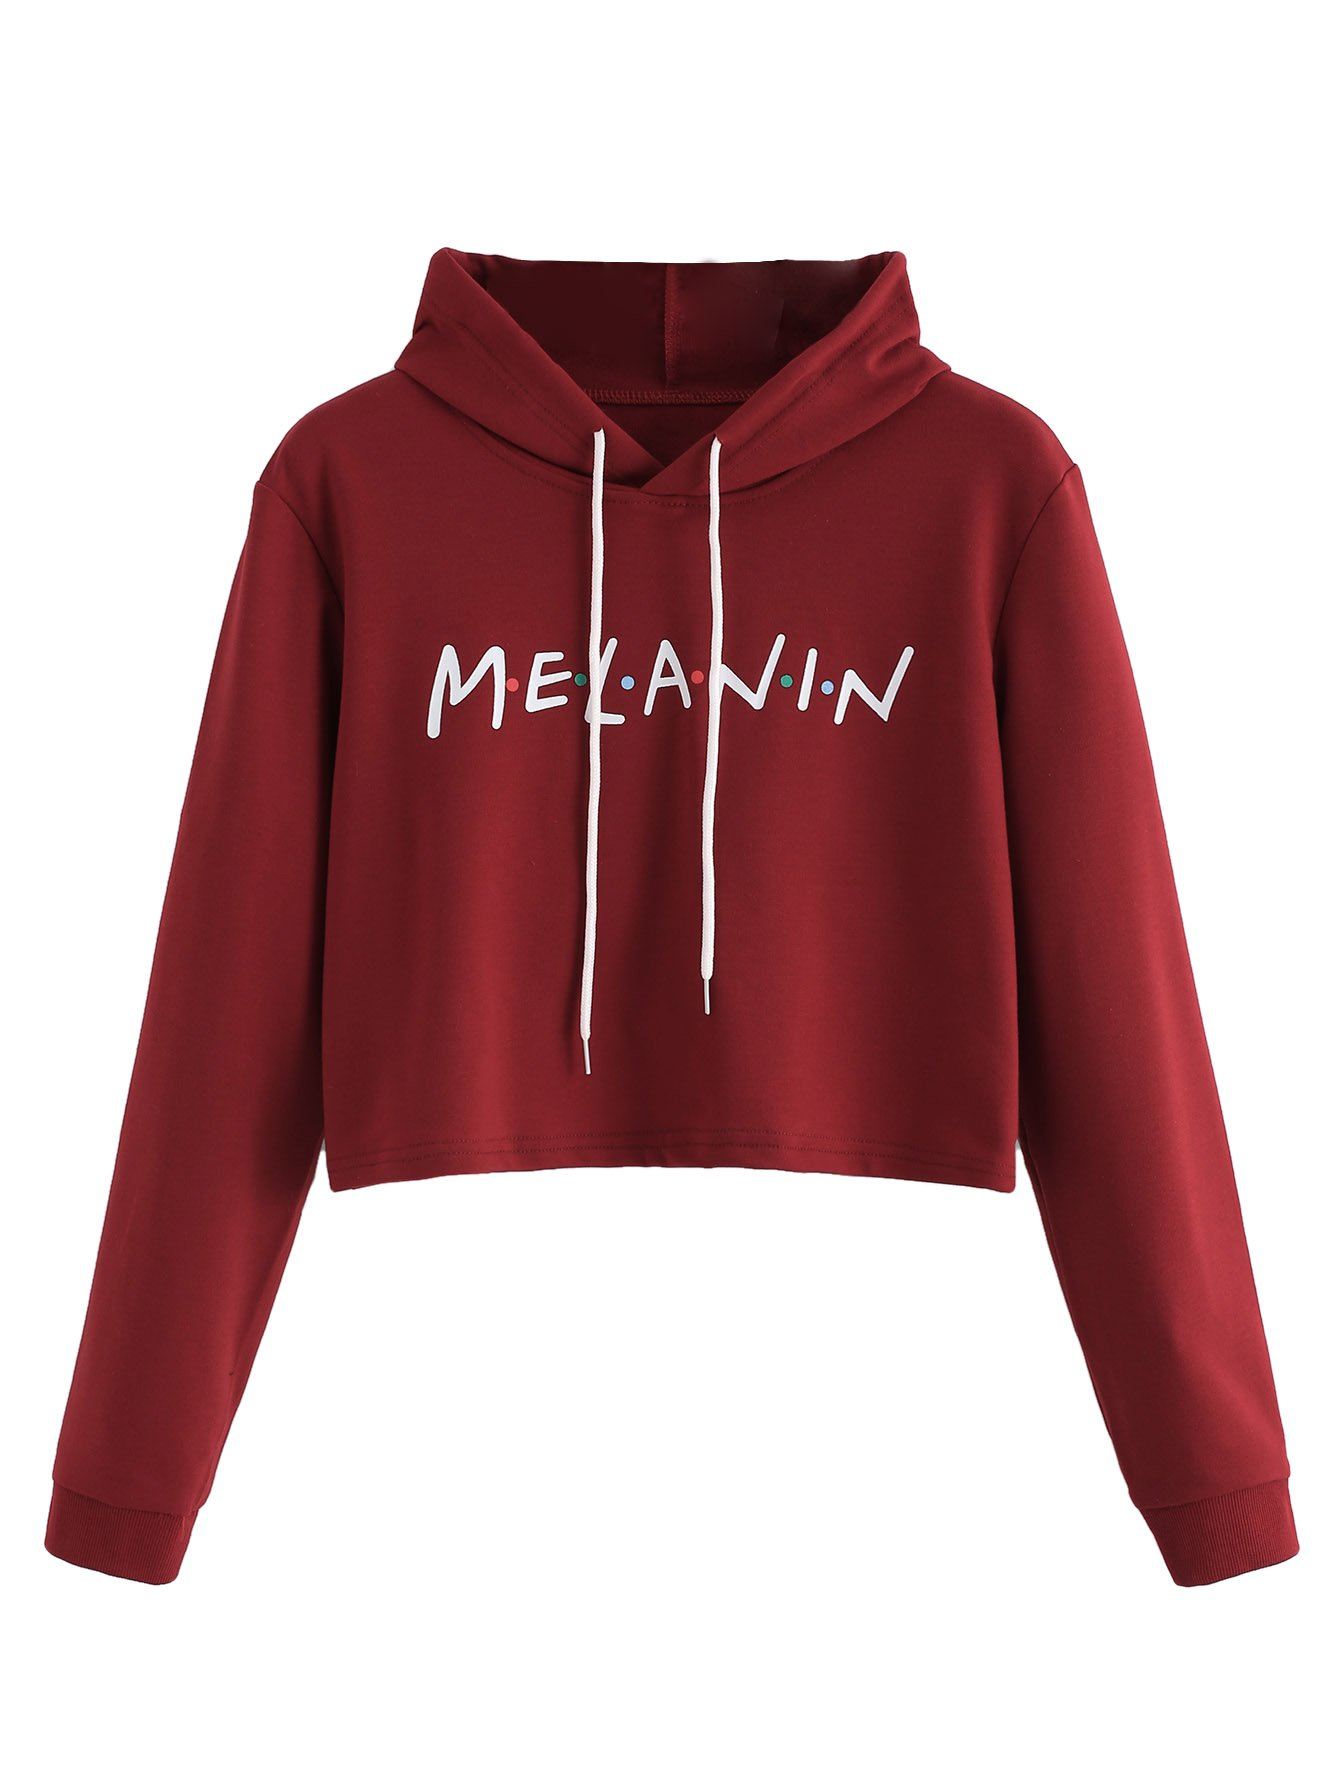 MakeMeChic Women's Letter Print Crop Top Sweatshirt Pullover Hoodie Red S